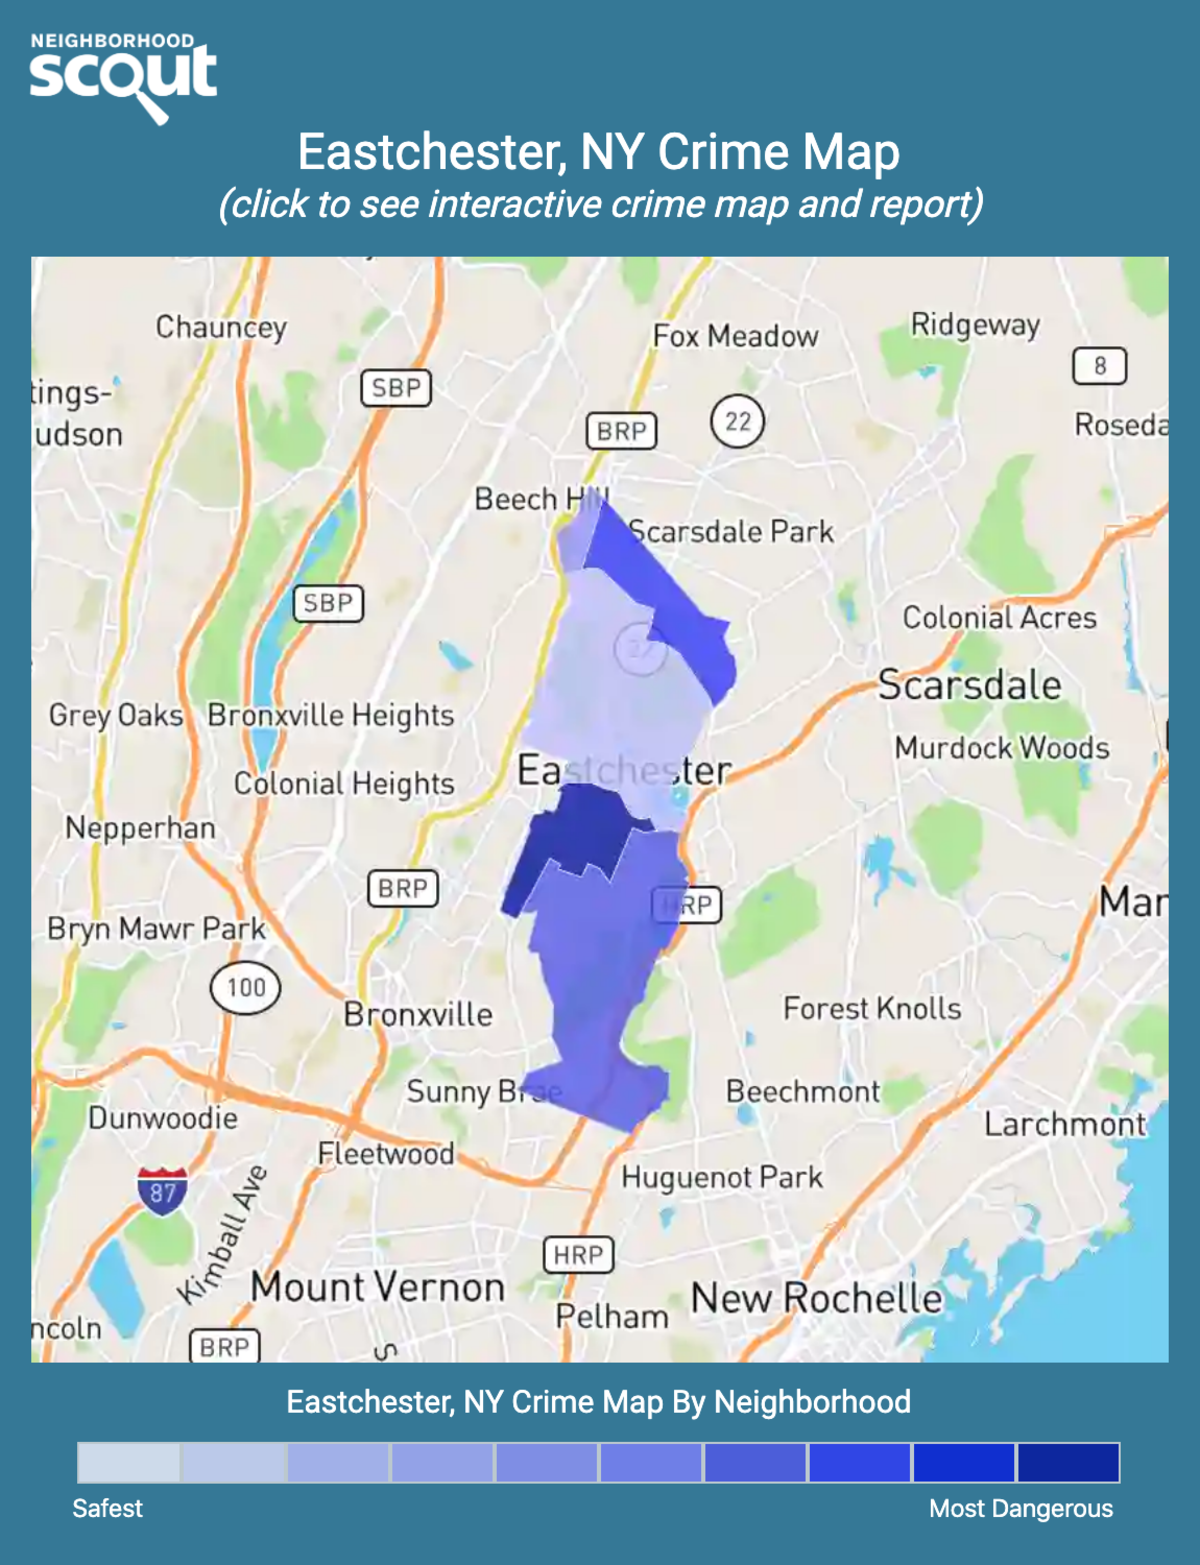 Eastchester, New York crime map